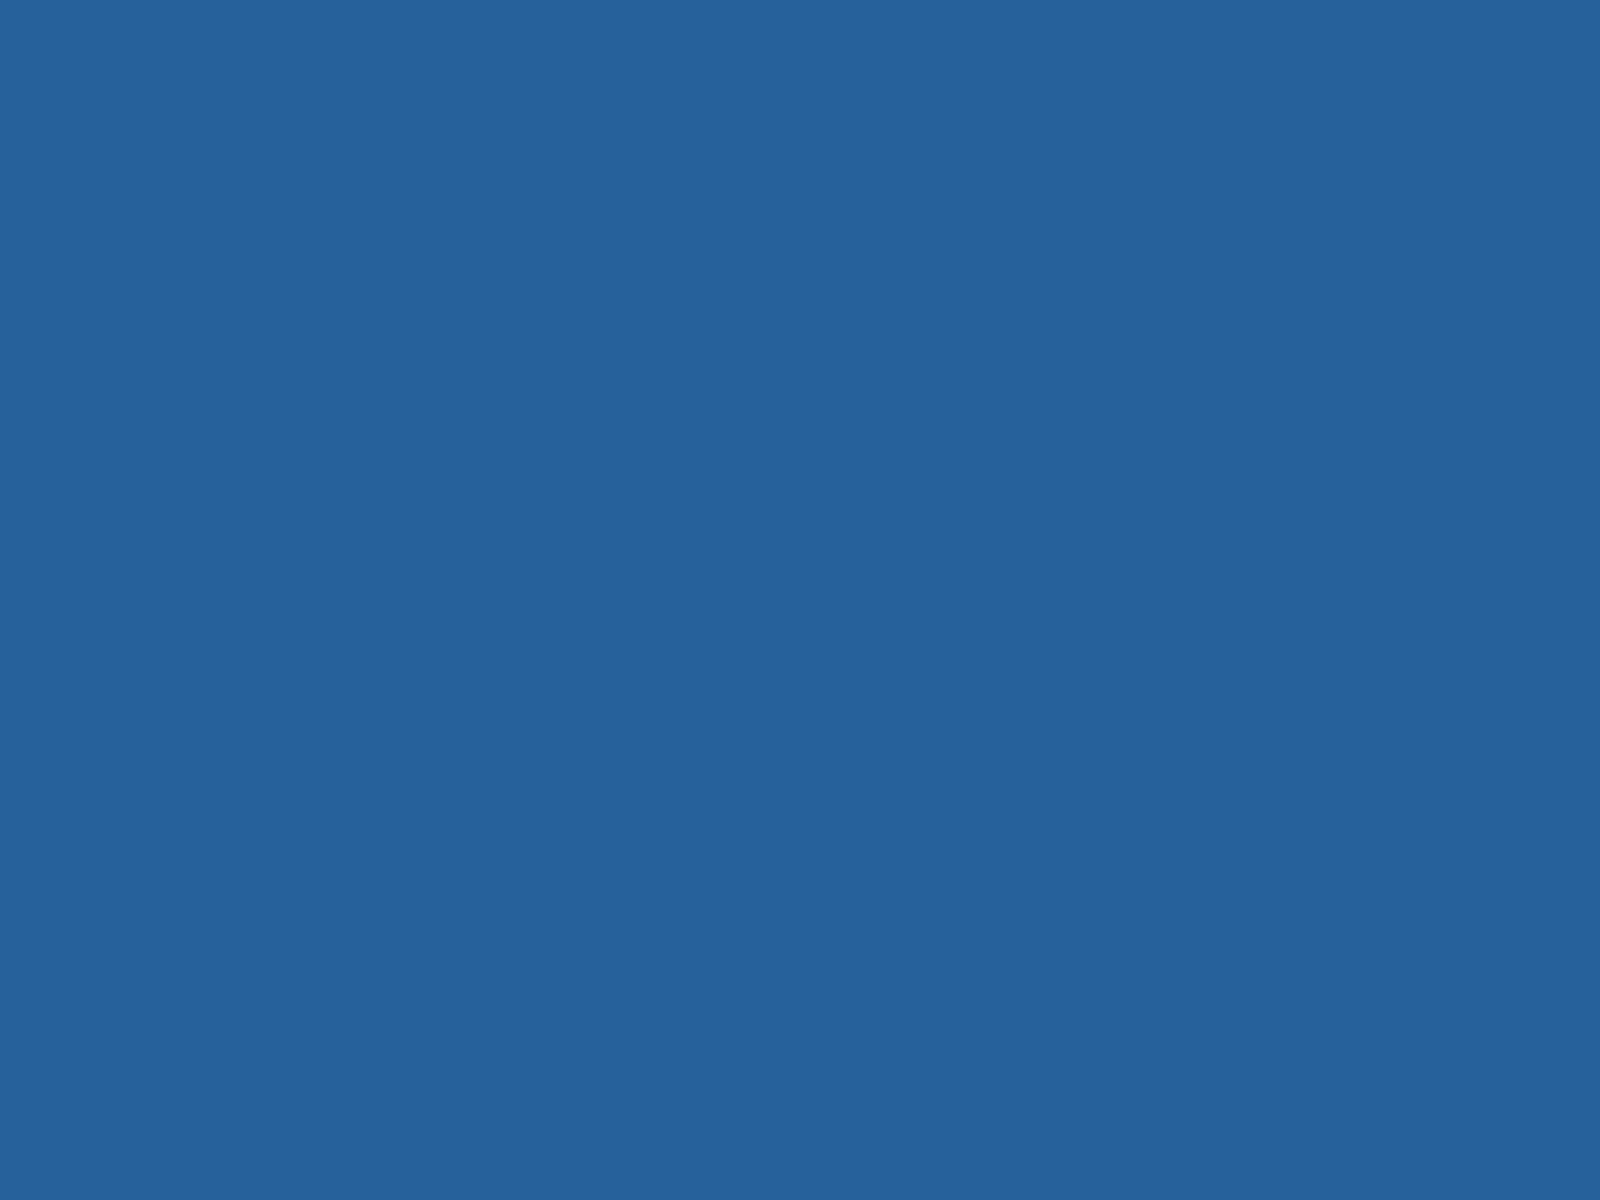 1600x1200 Lapis Lazuli Solid Color Background